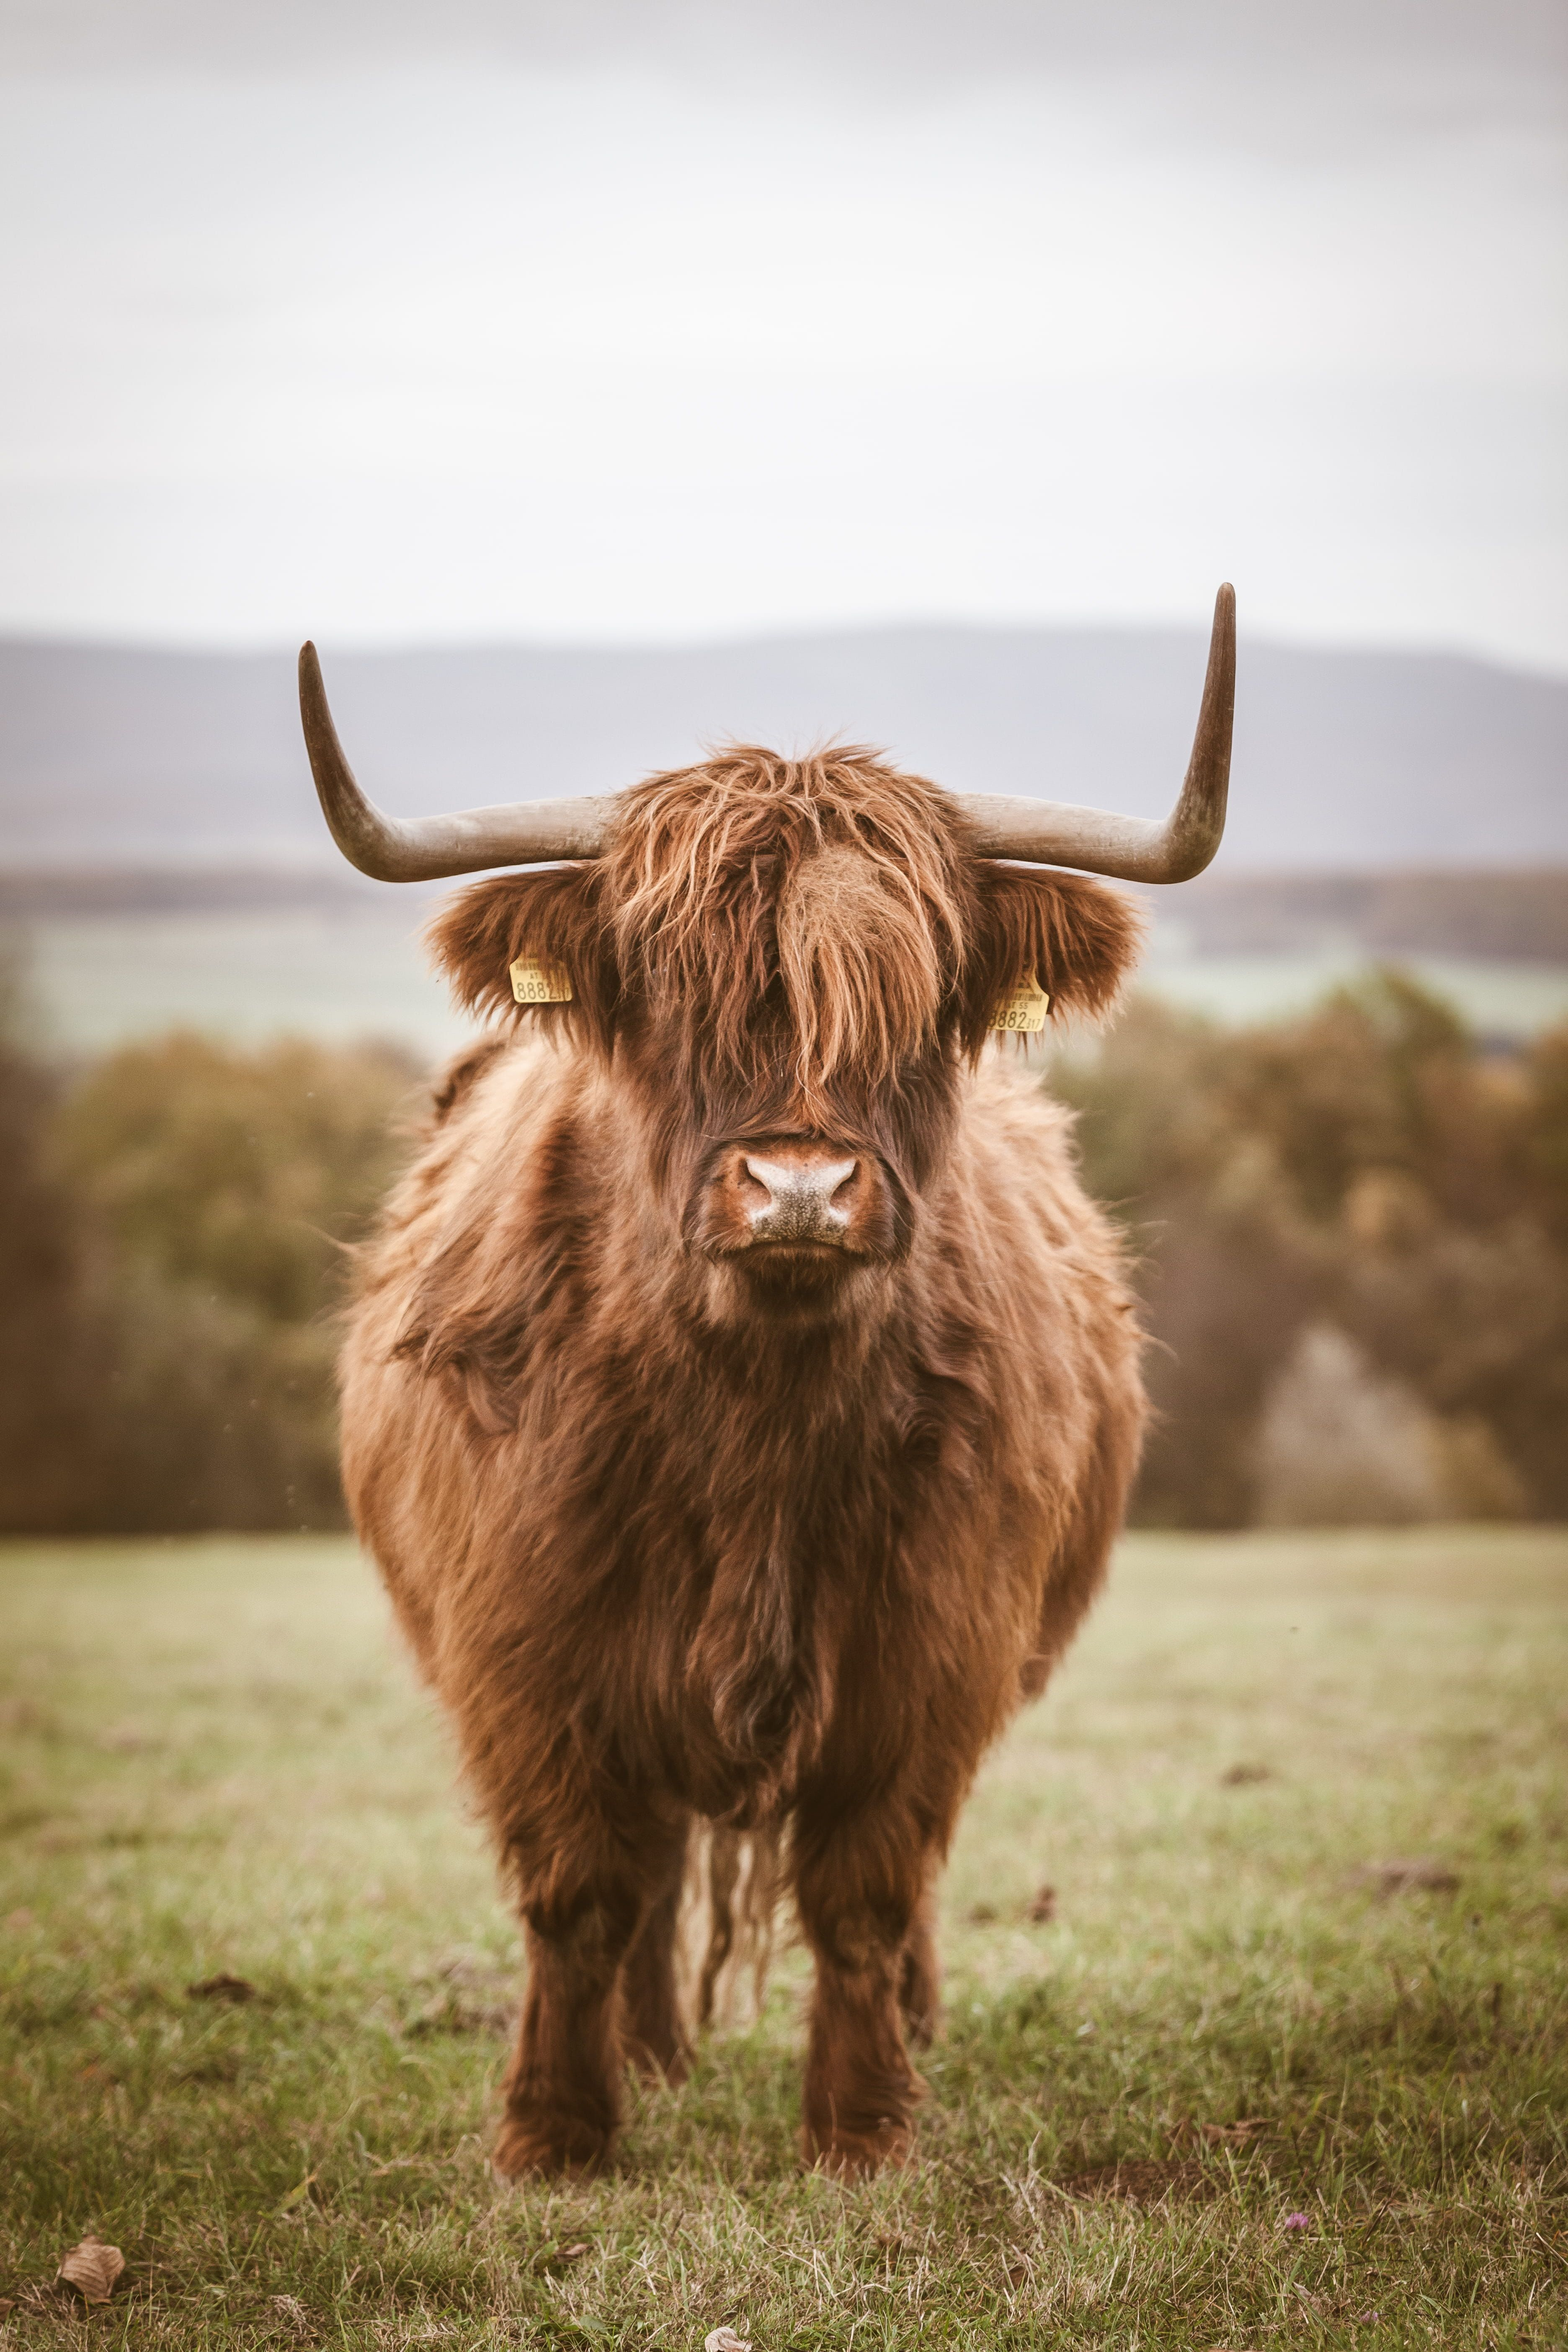 Brown Yak Photo During Daytime 5k Wallpaper Hdwallpaper Desktop Fluffy Cows Cow Wallpaper Cute Baby Cow